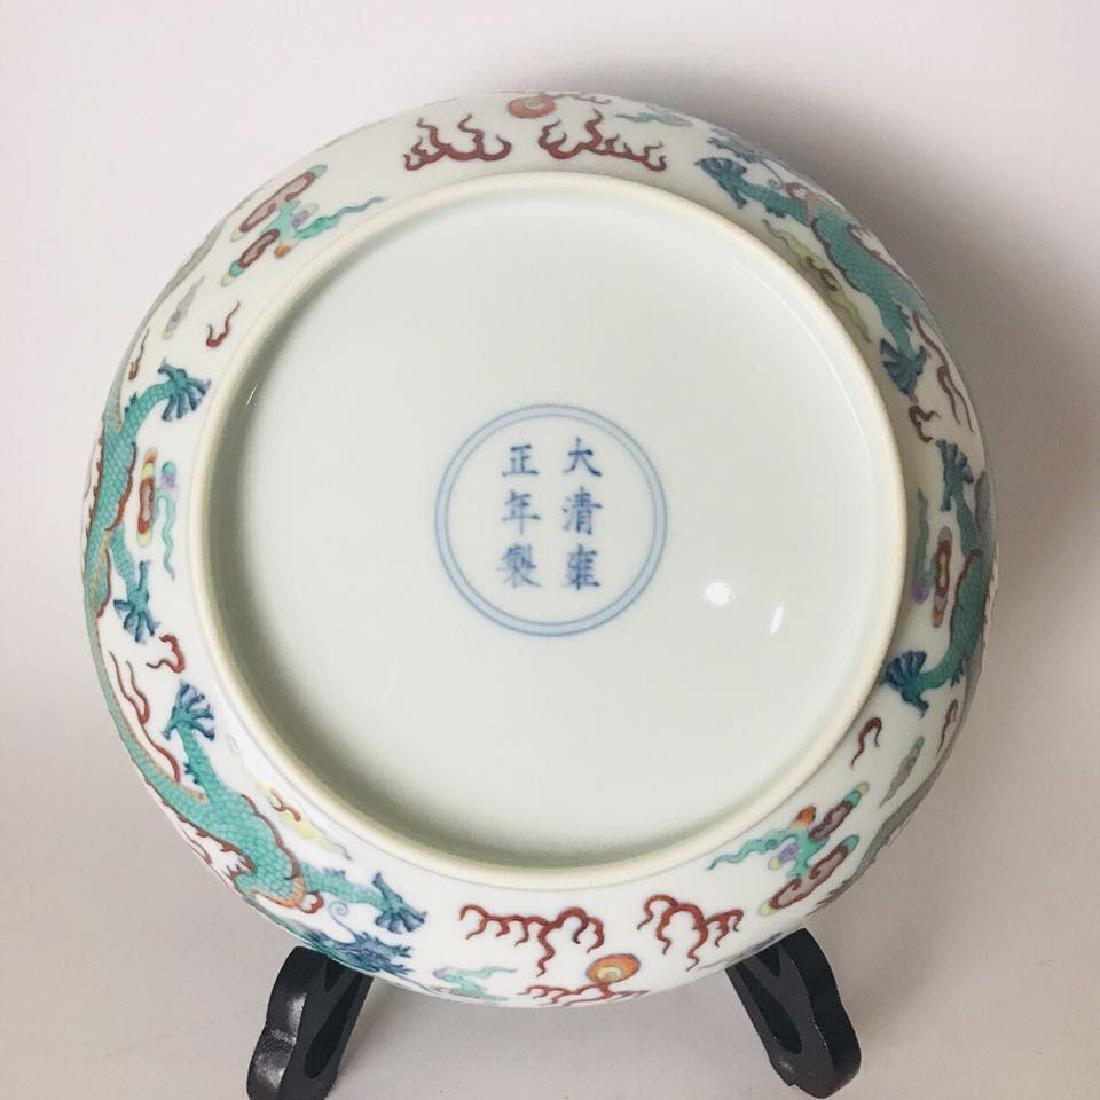 DouCai Porcelain Dragon Plate Mark Da Qing - 4